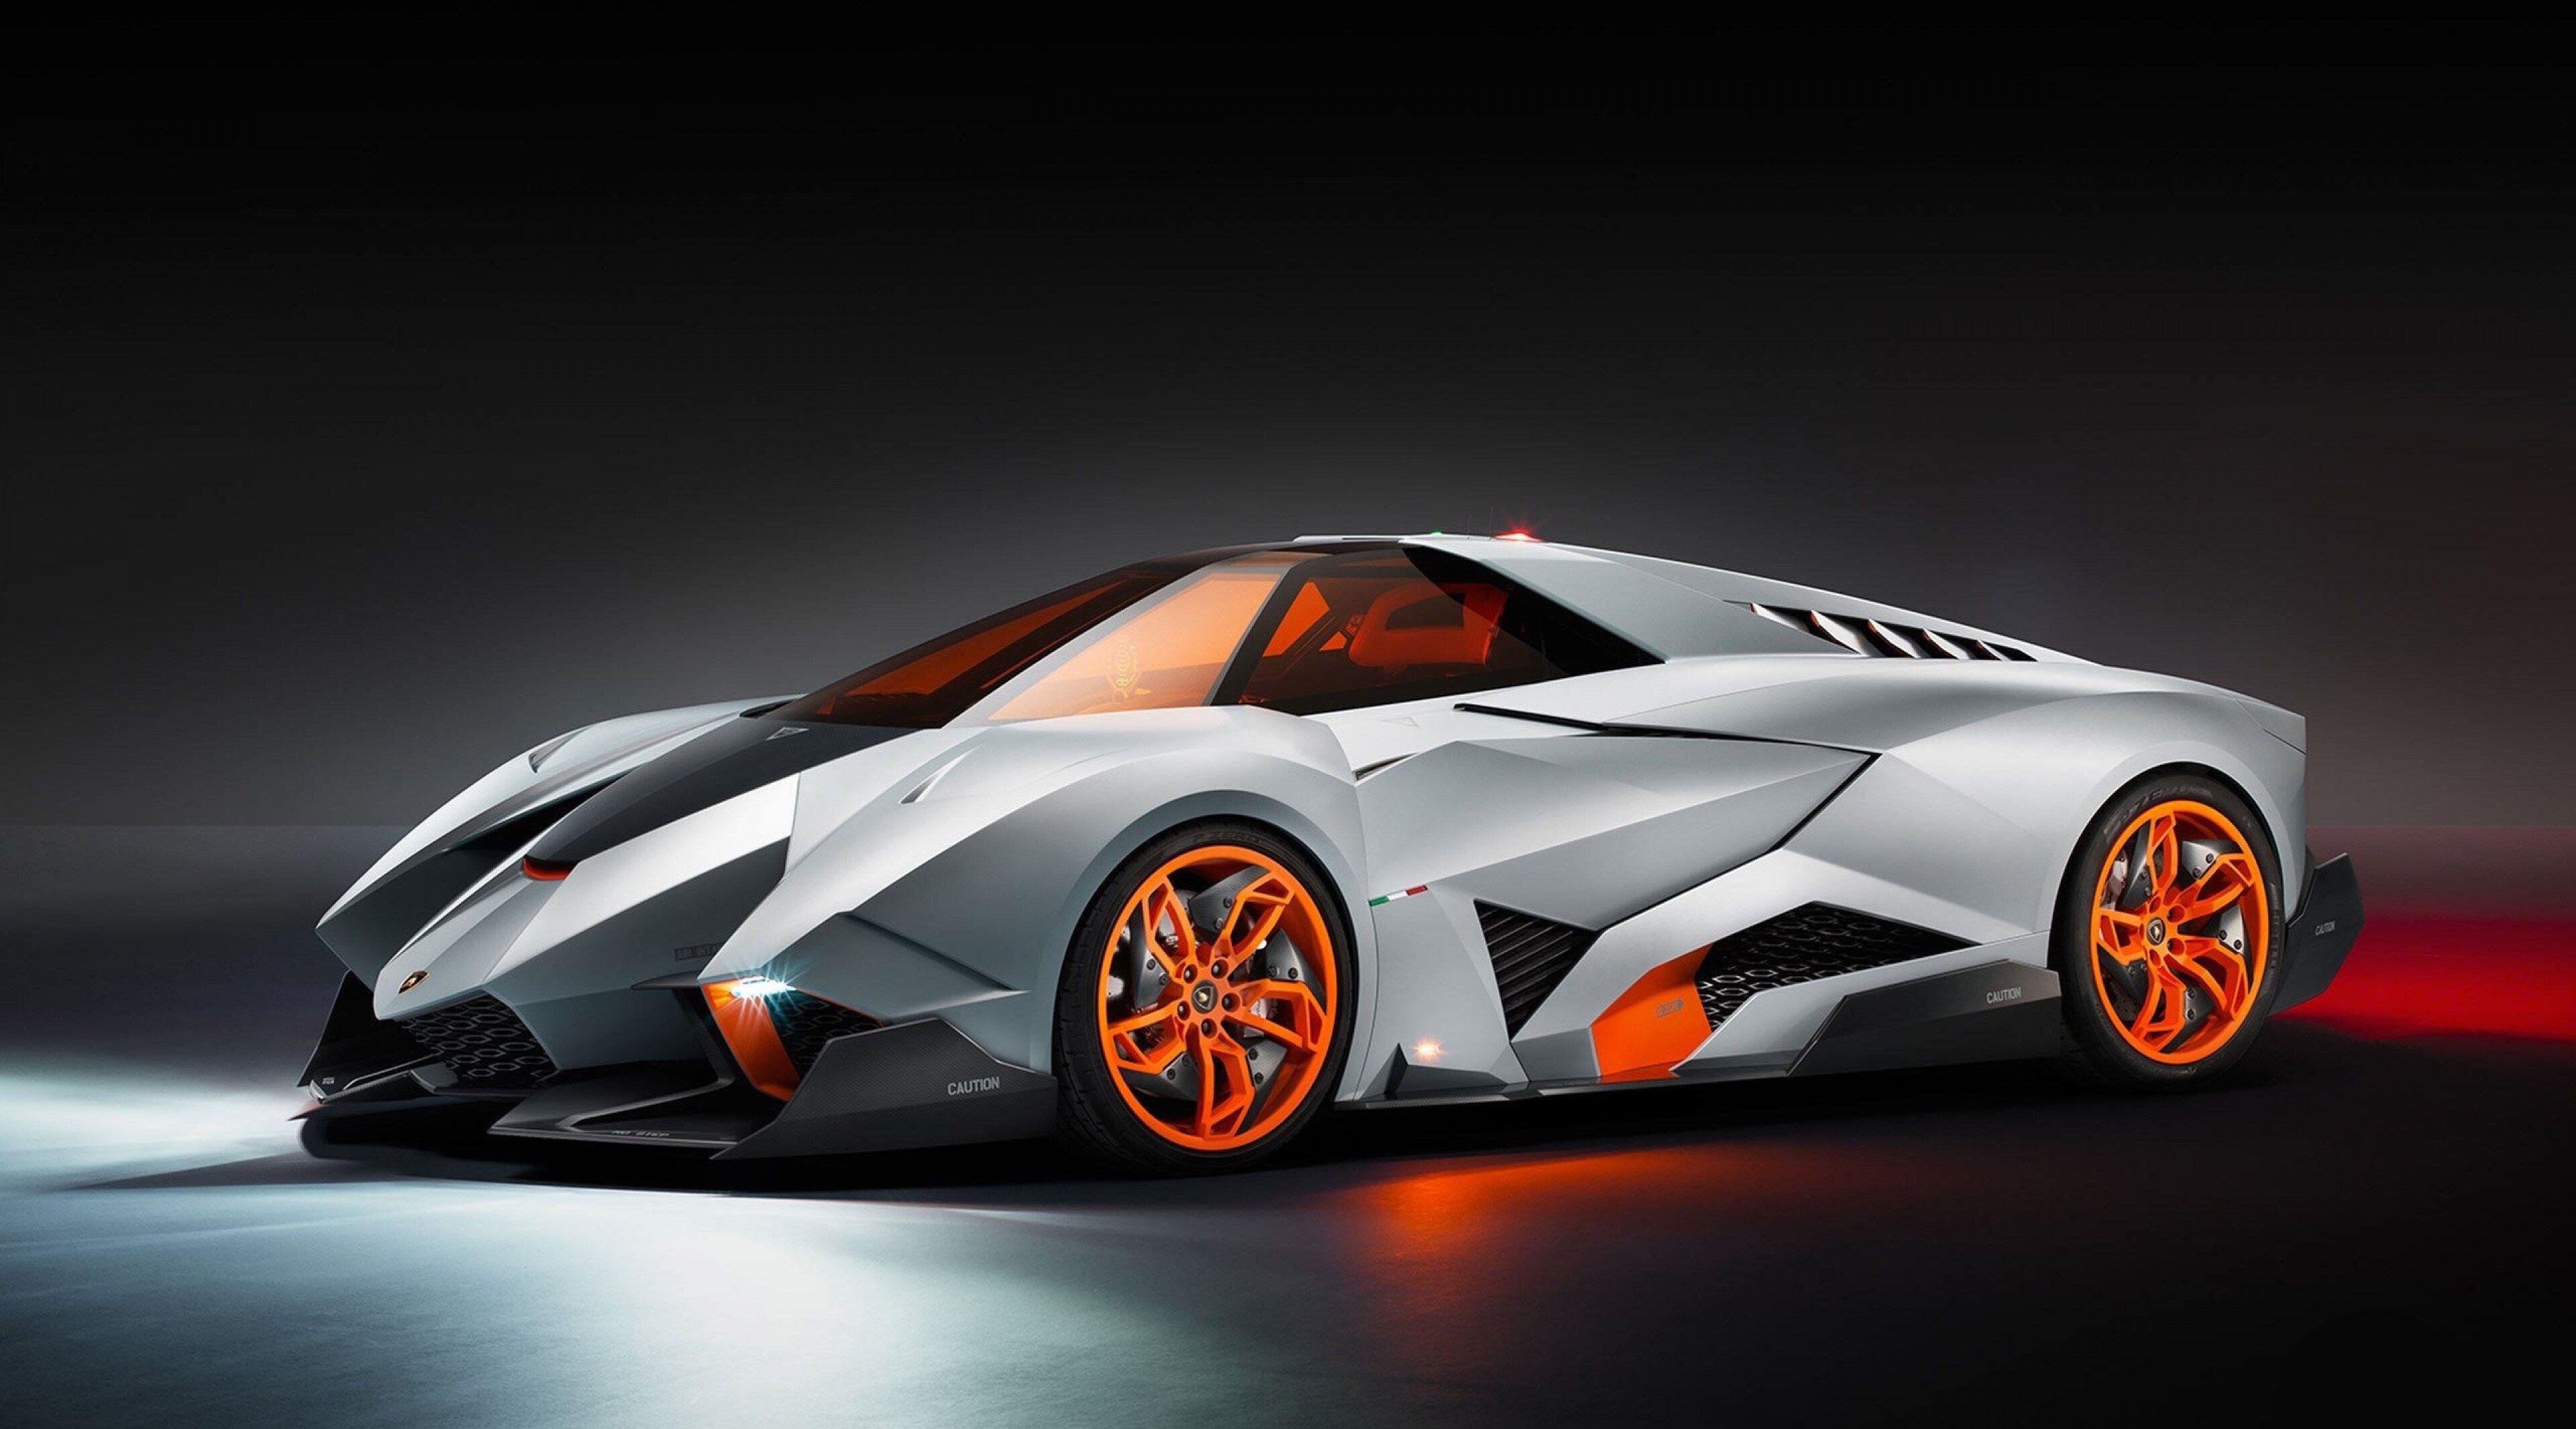 3840x2130 Egoista 4k Desktop Hd Wallpaper Lamborghini Egoista Futuristic Cars Cool Cars